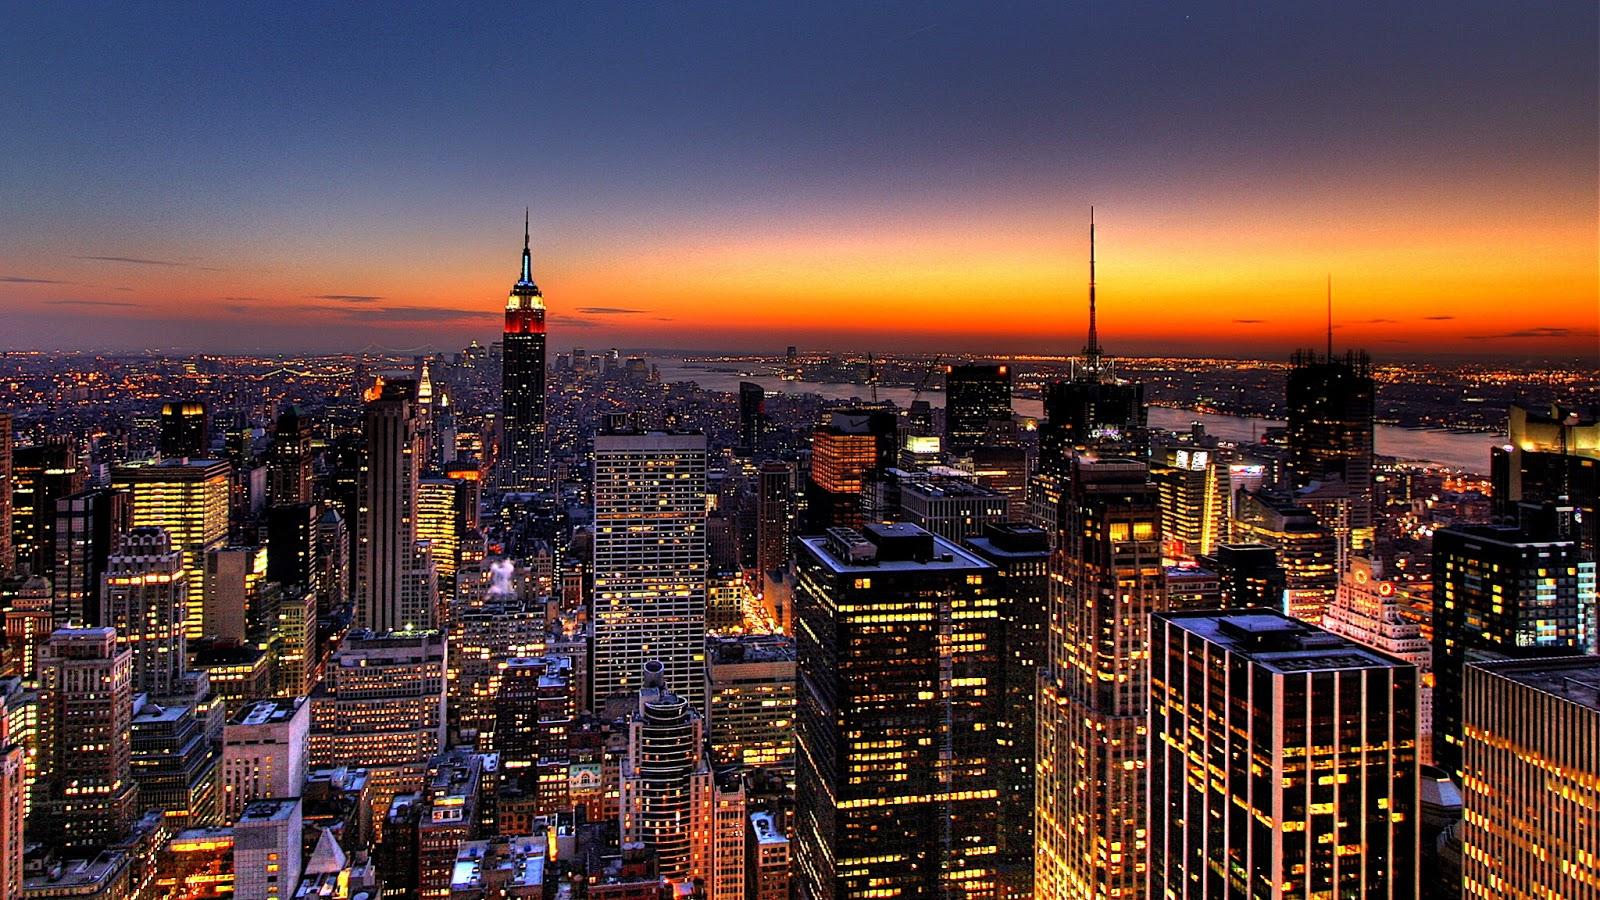 10 Kota Terindah Pada Malam Hari All About The World